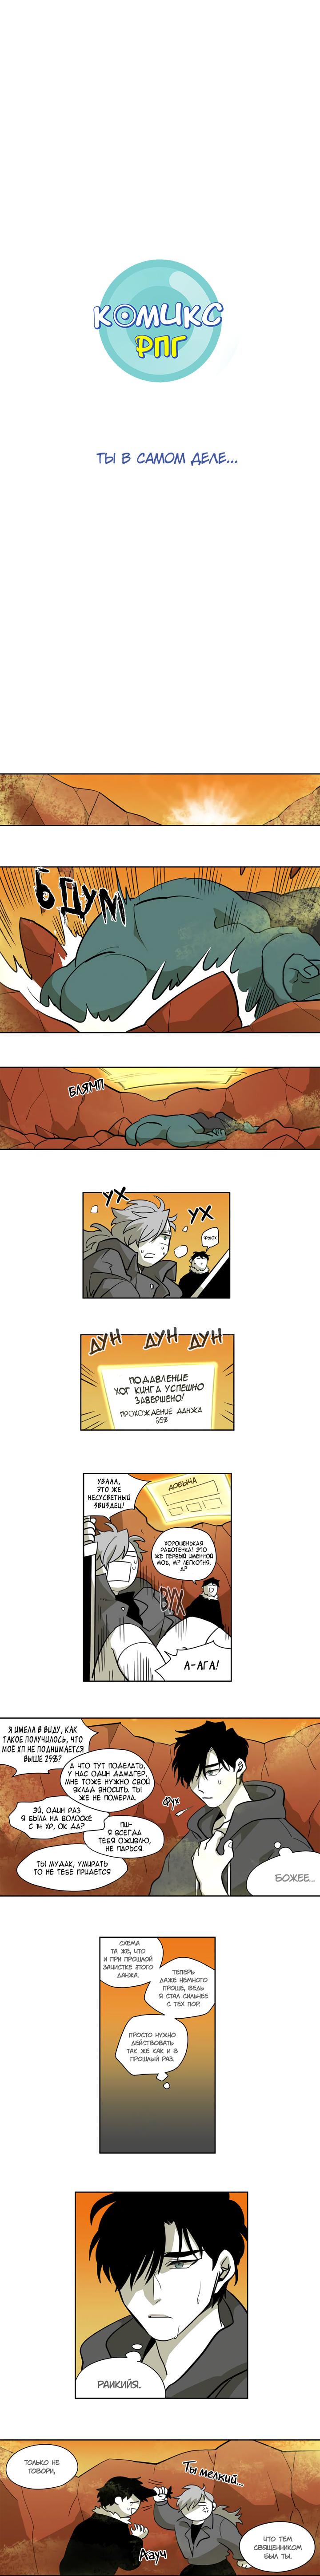 https://r1.ninemanga.com/comics/pic2/36/27364/896515/1539259771527.jpg Page 1